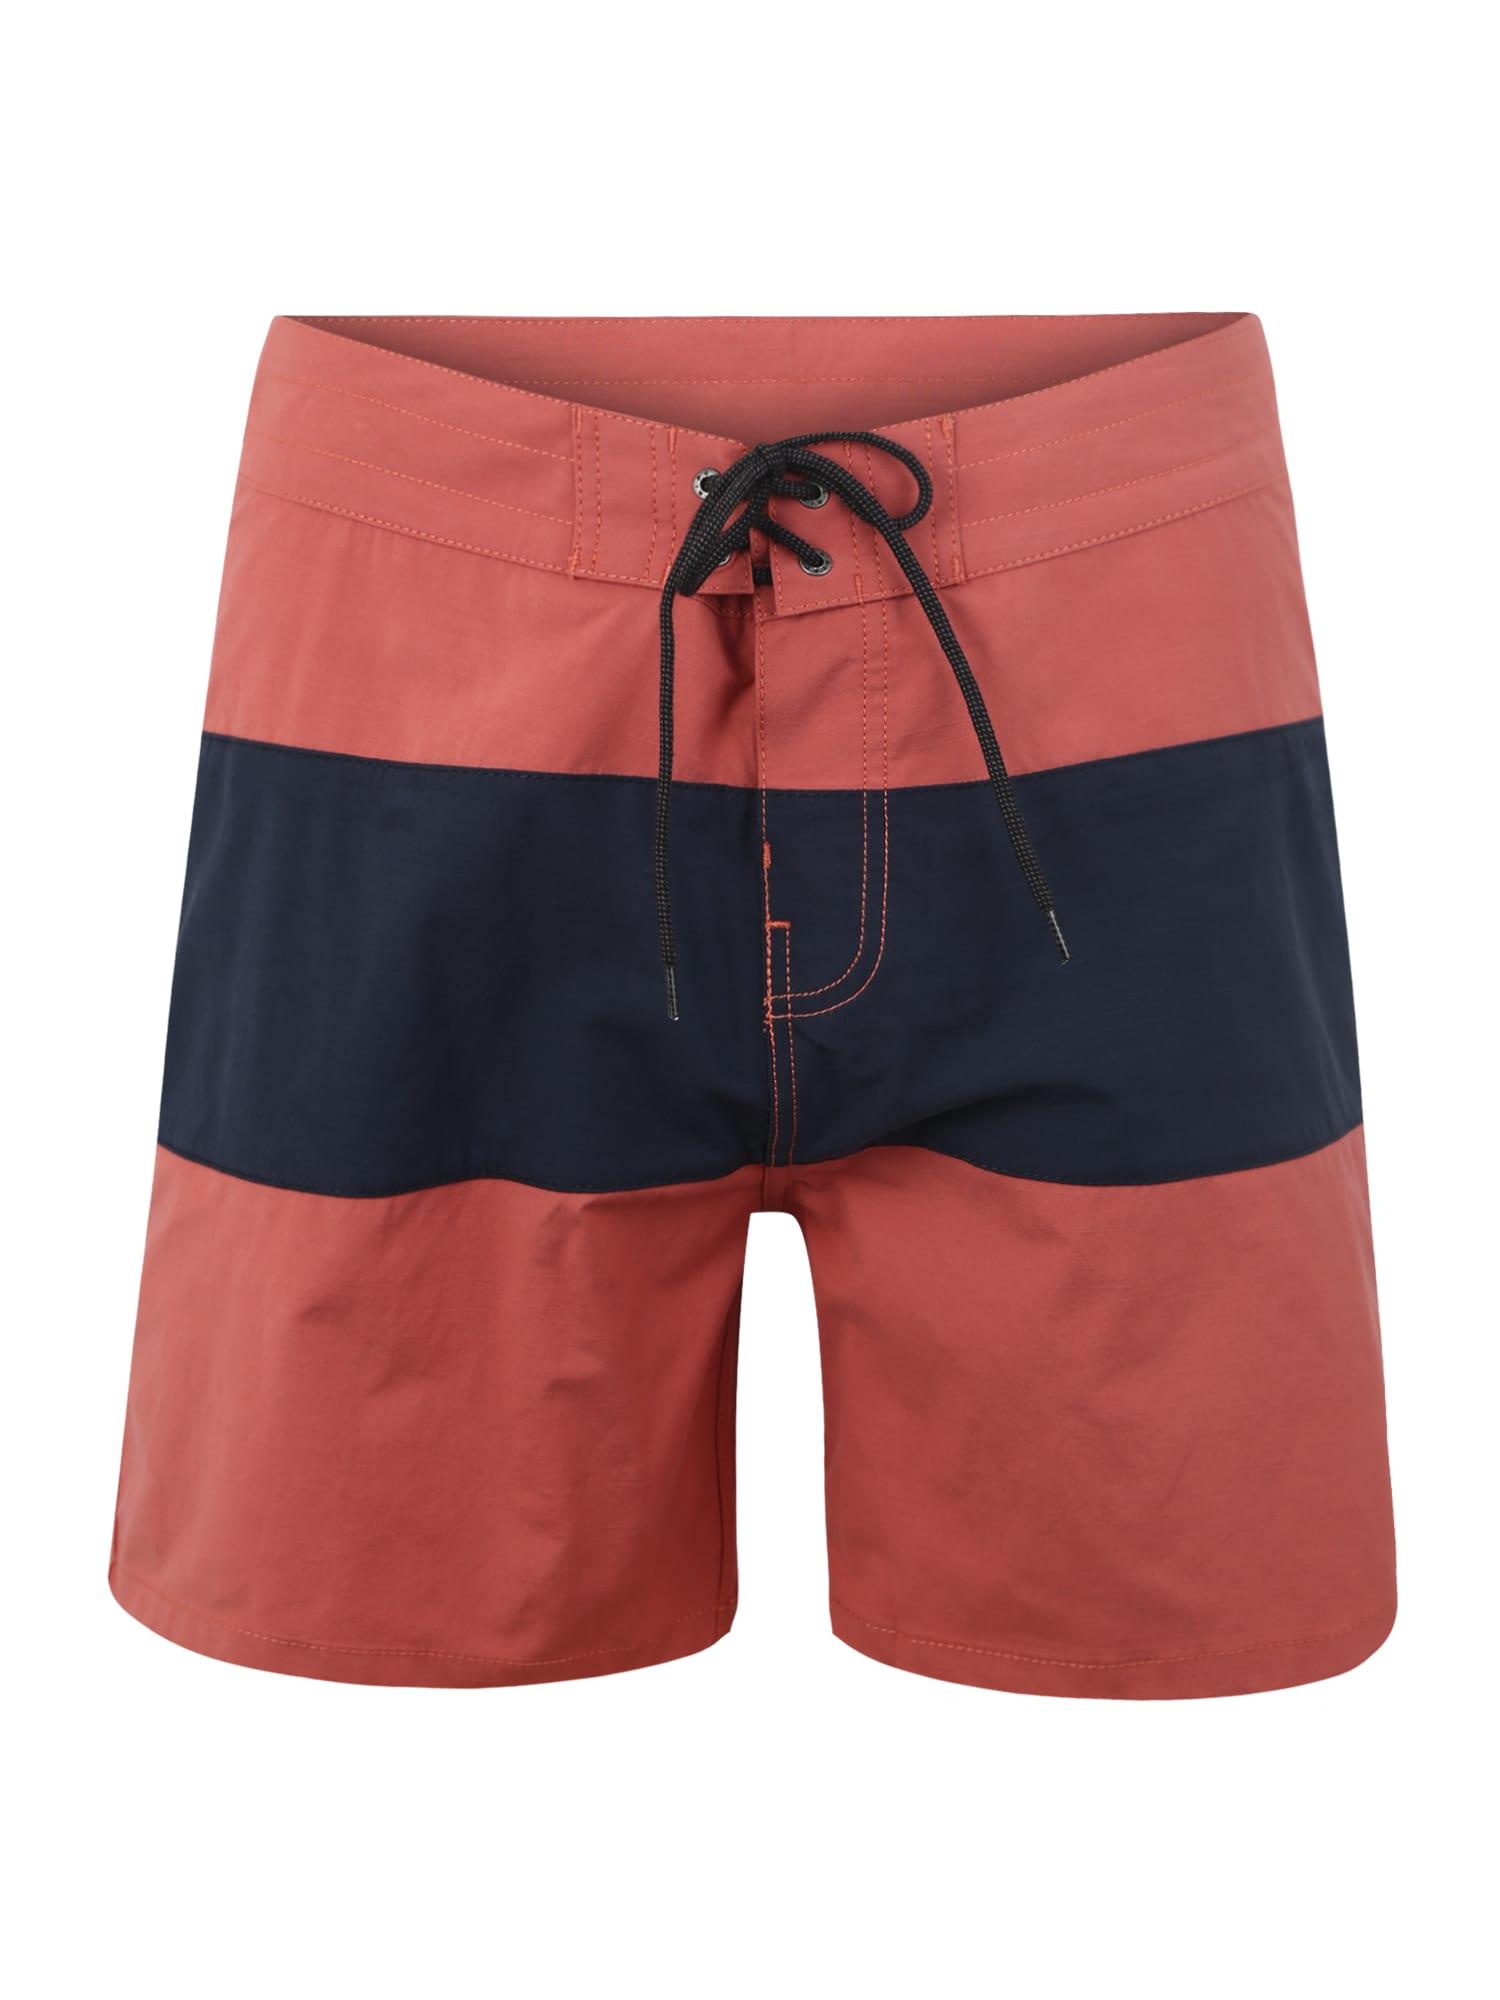 Plavecké šortky RETRO PANELED 17 blau rot RIP CURL